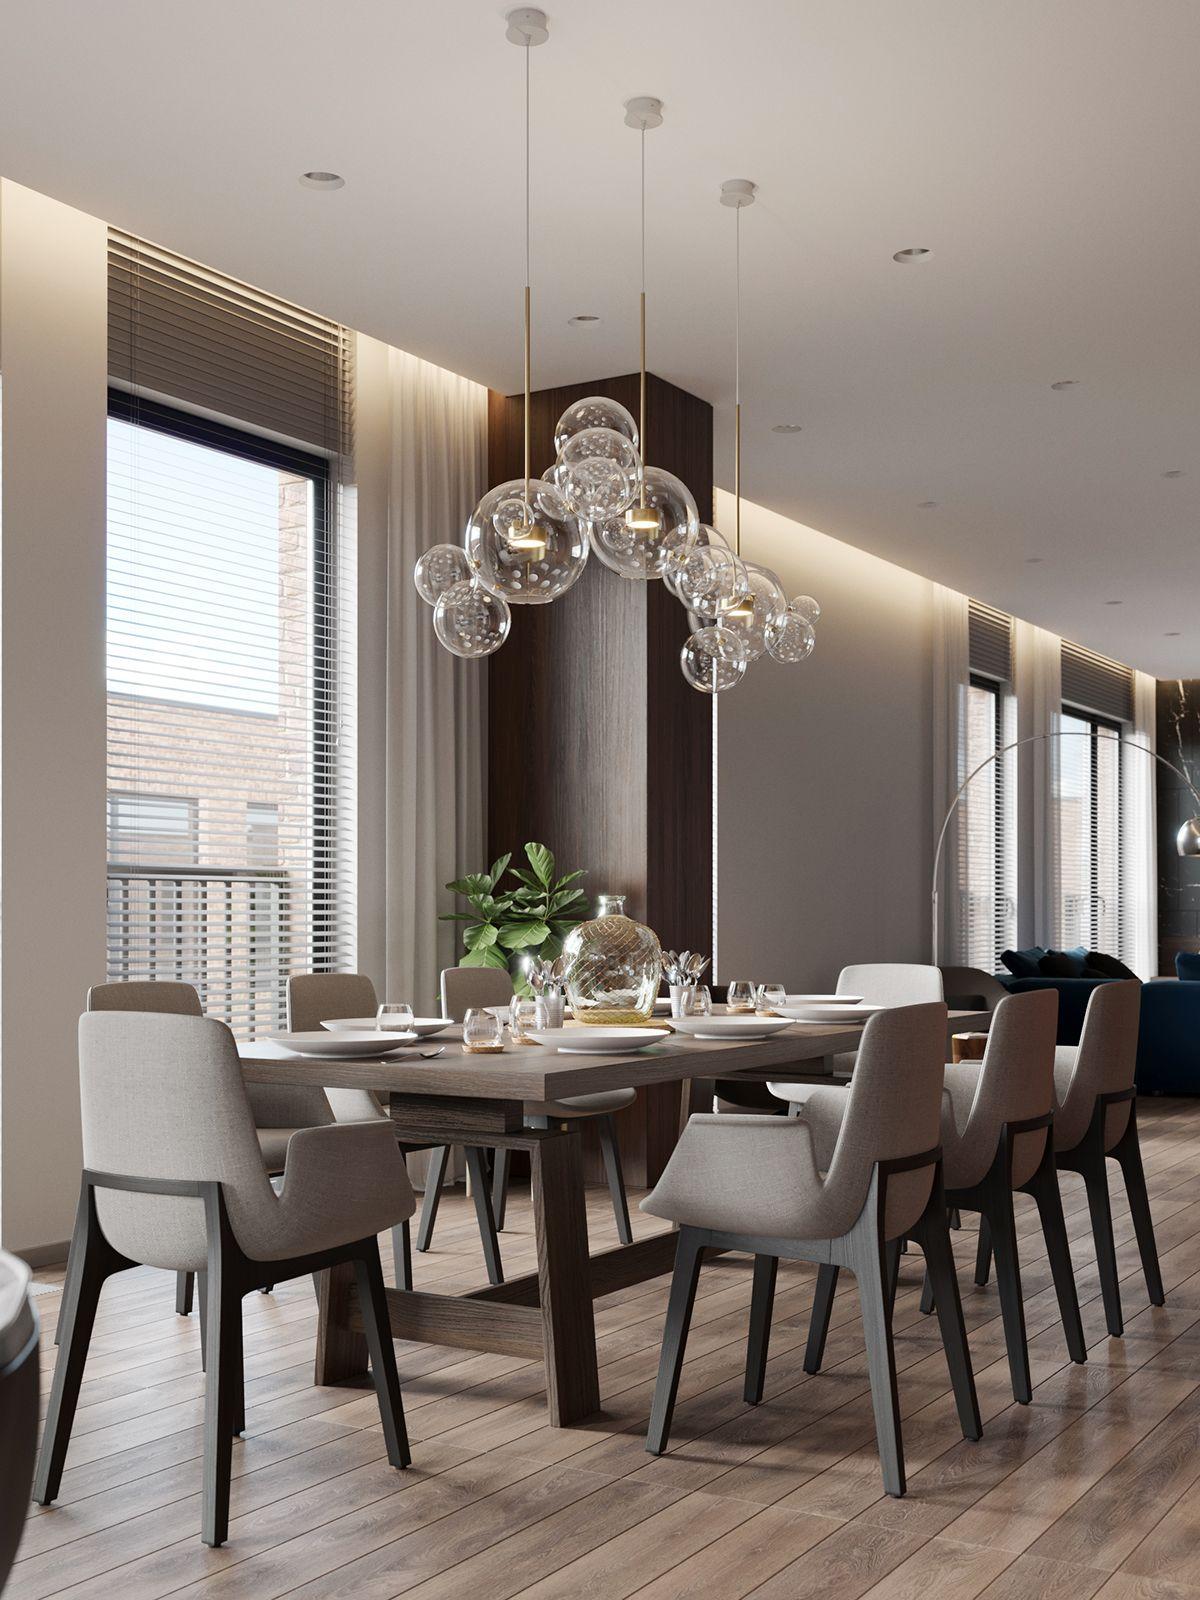 Apartment For Jaguar In Almaty Kazakhstan 2 On Behance Dining